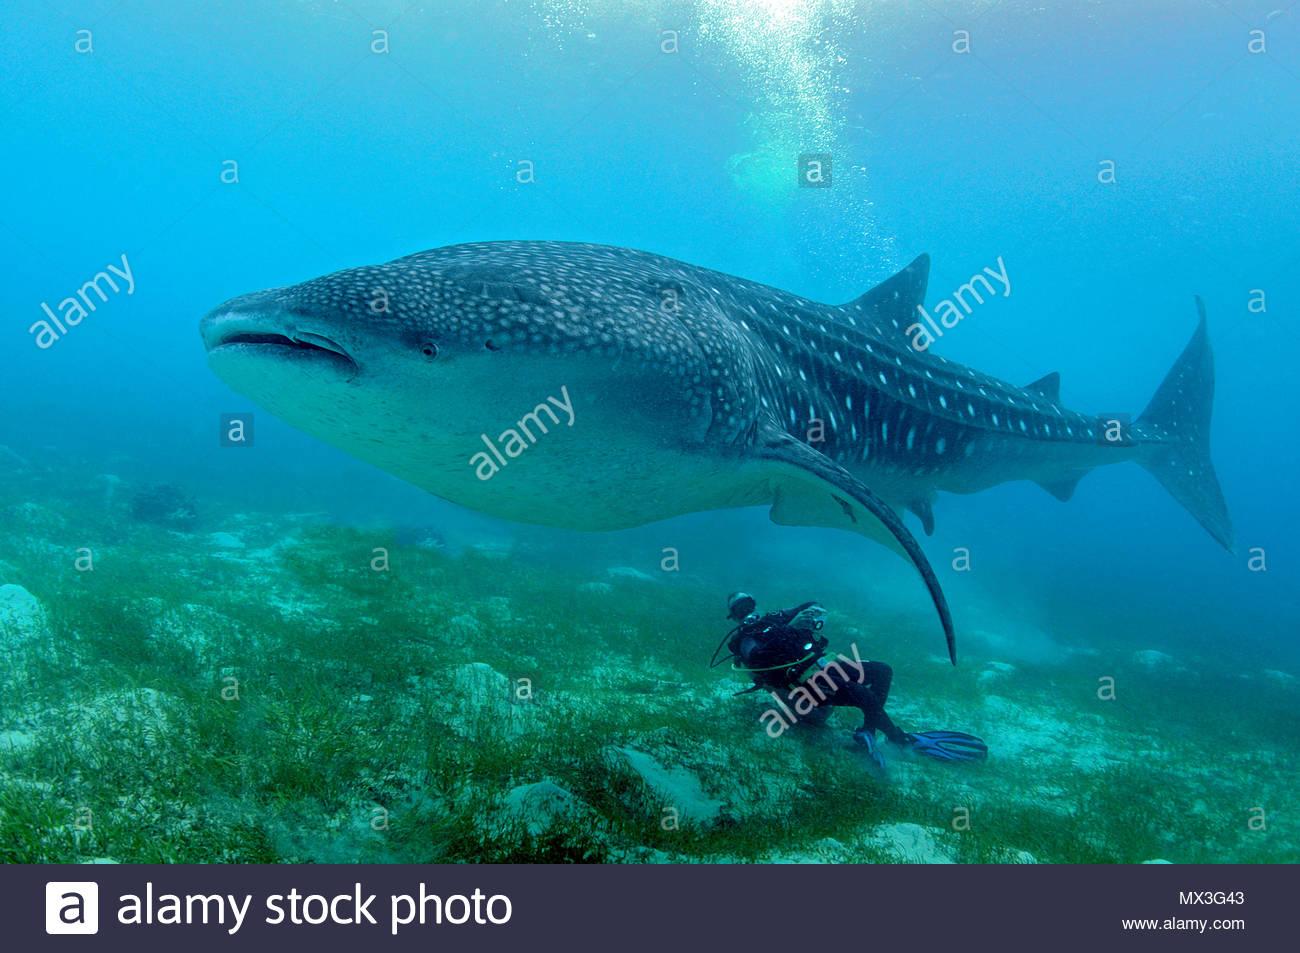 Scuba diver watching a Whale shark (Rhincodon typus), biggest fish of world, Oslob, Cebu, Philippines, Asia - Stock Image